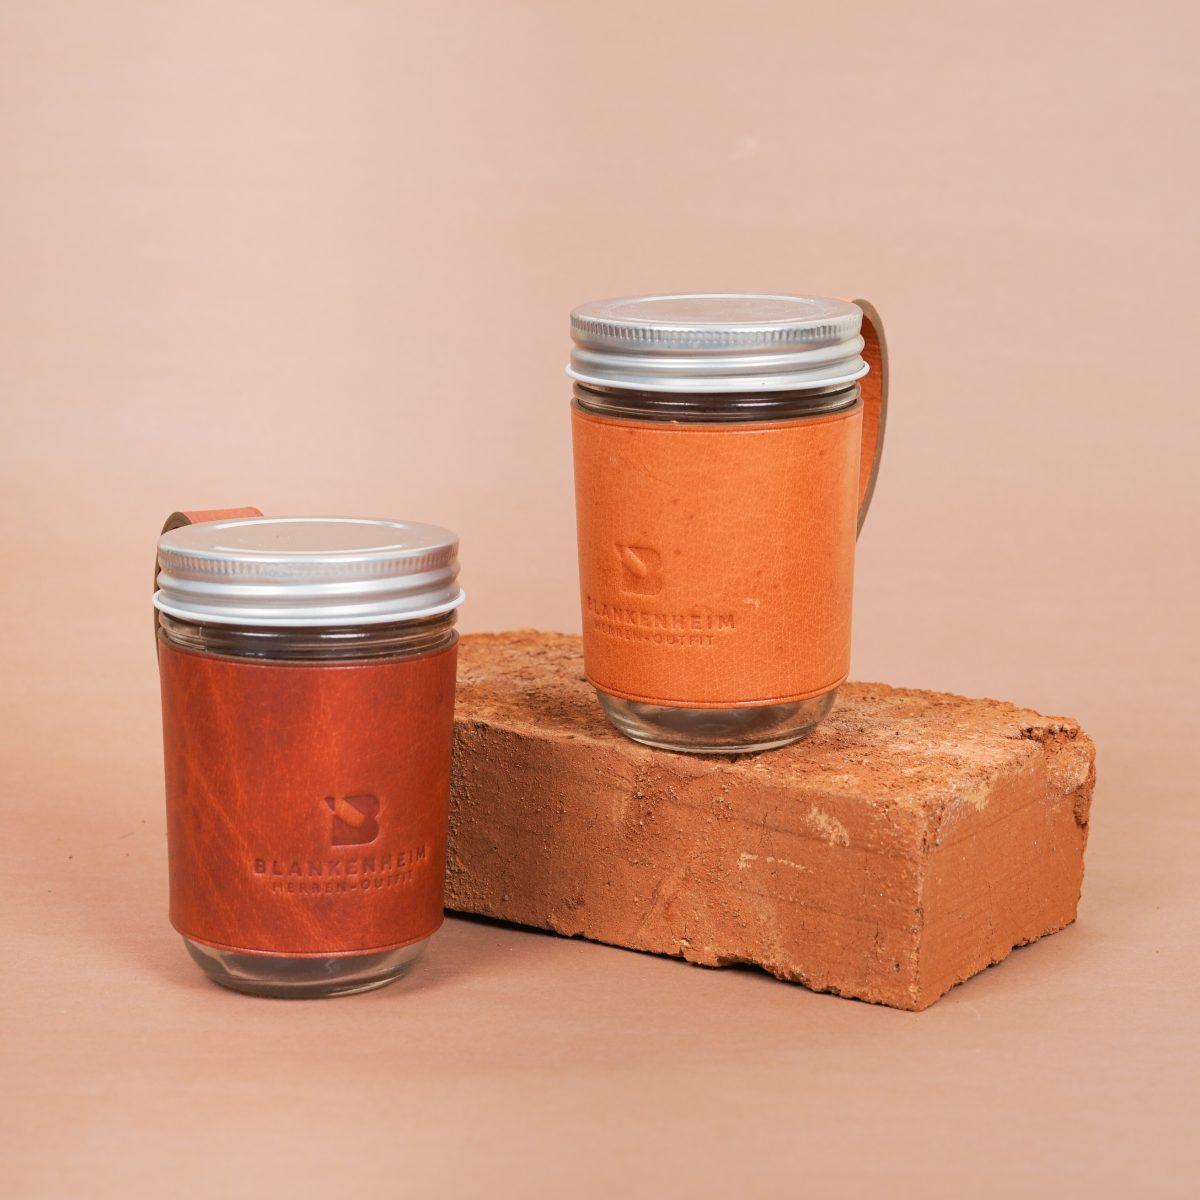 Mason Jar Leather Cover